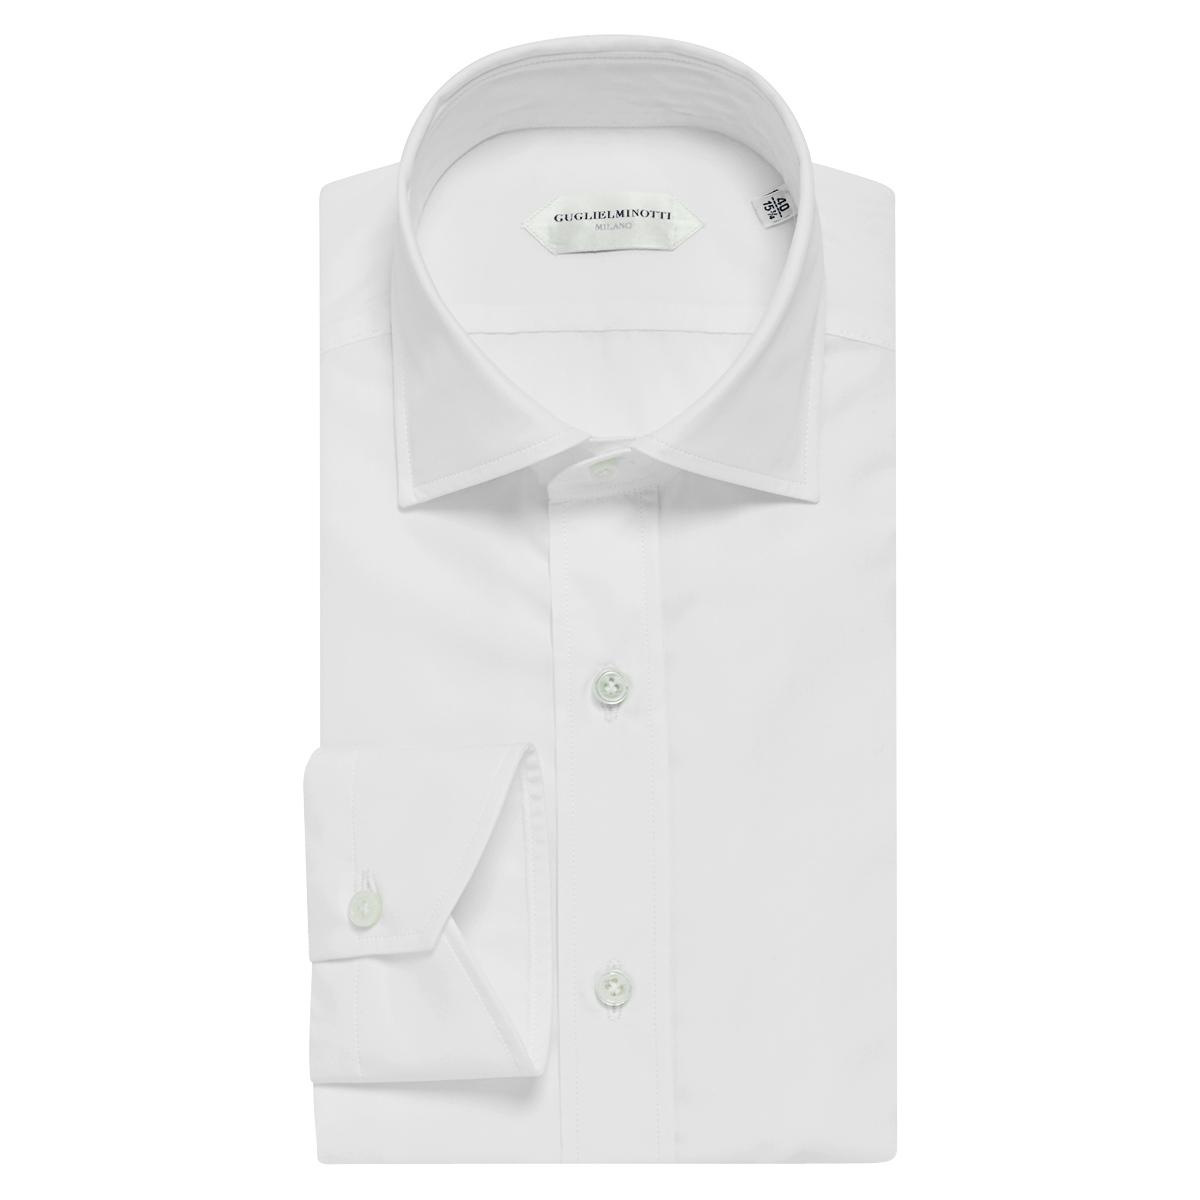 White Cotton Classic Shirt